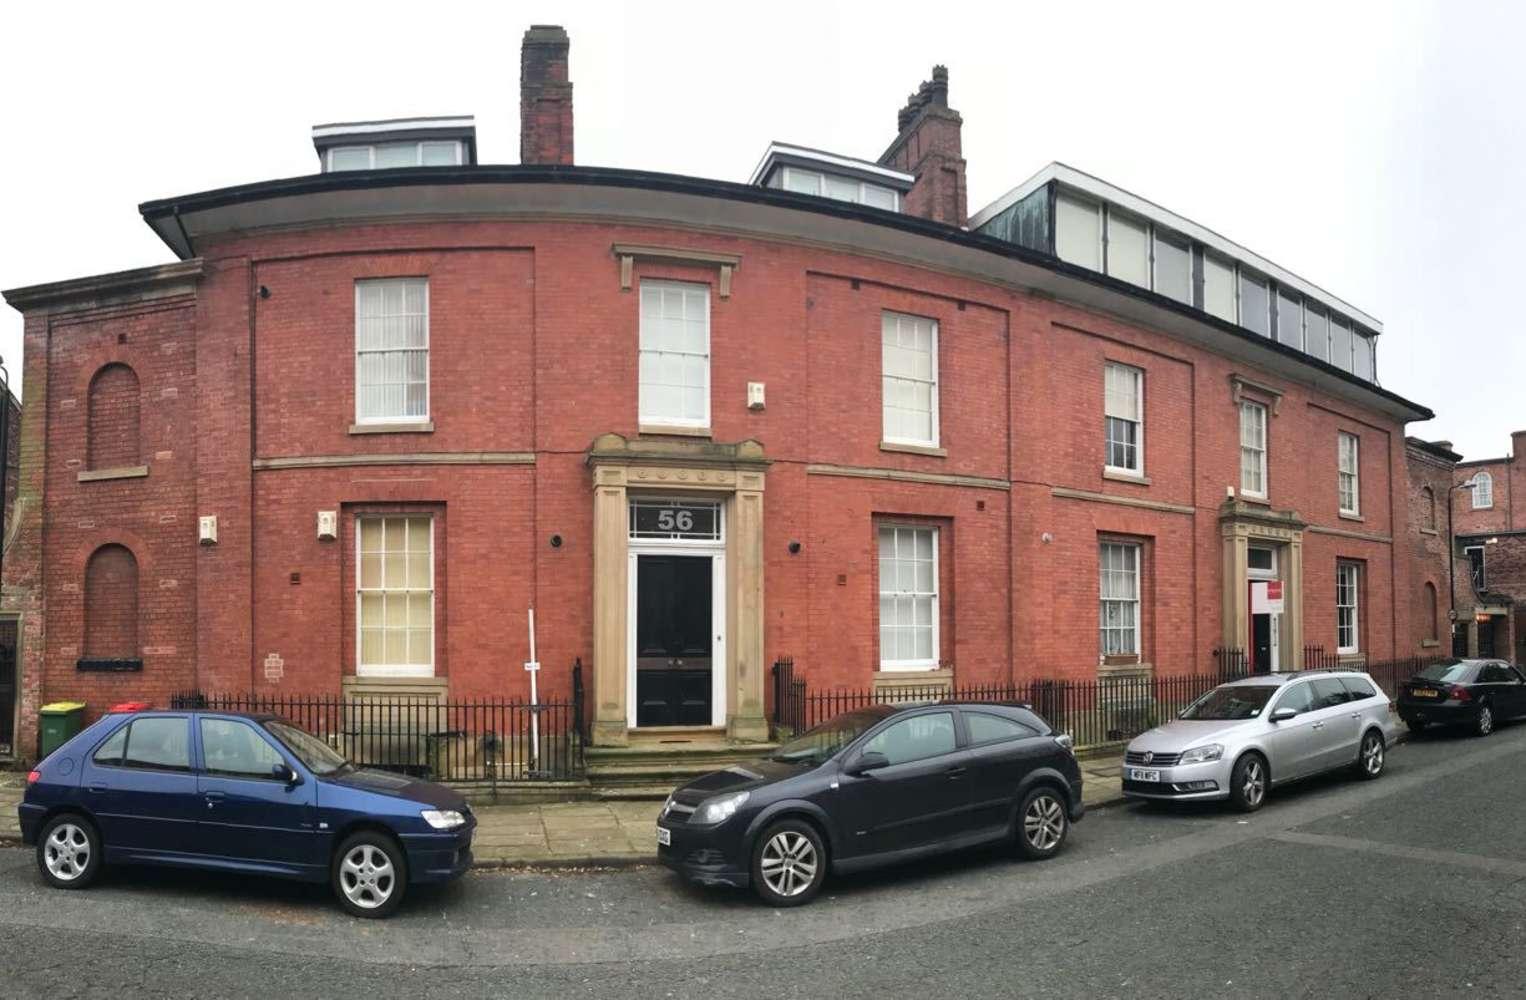 Residential use Preston, PR1 8HU - Flats 1-11 - 0019